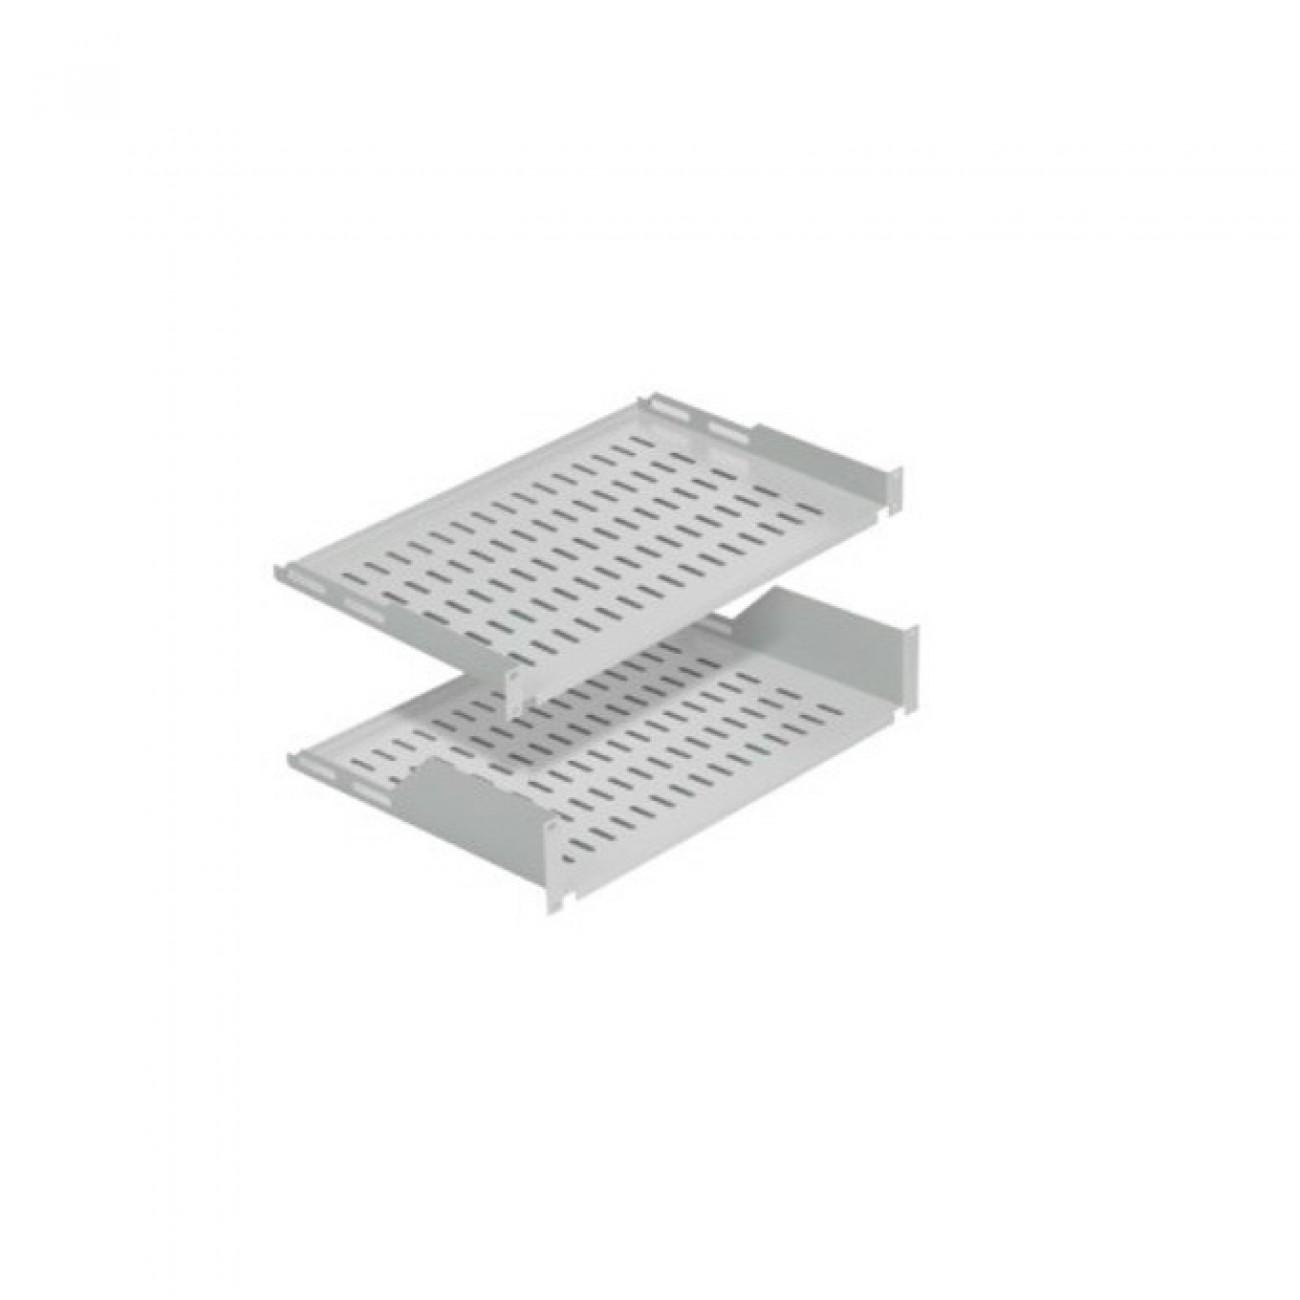 Тава Mirsan MR.RAK1U30, 19, 1U, за комуникационен шкаф, 486x300x44мм, 30кг товароносимост, сива в Мрежови шкафове - Mirsan | Alleop